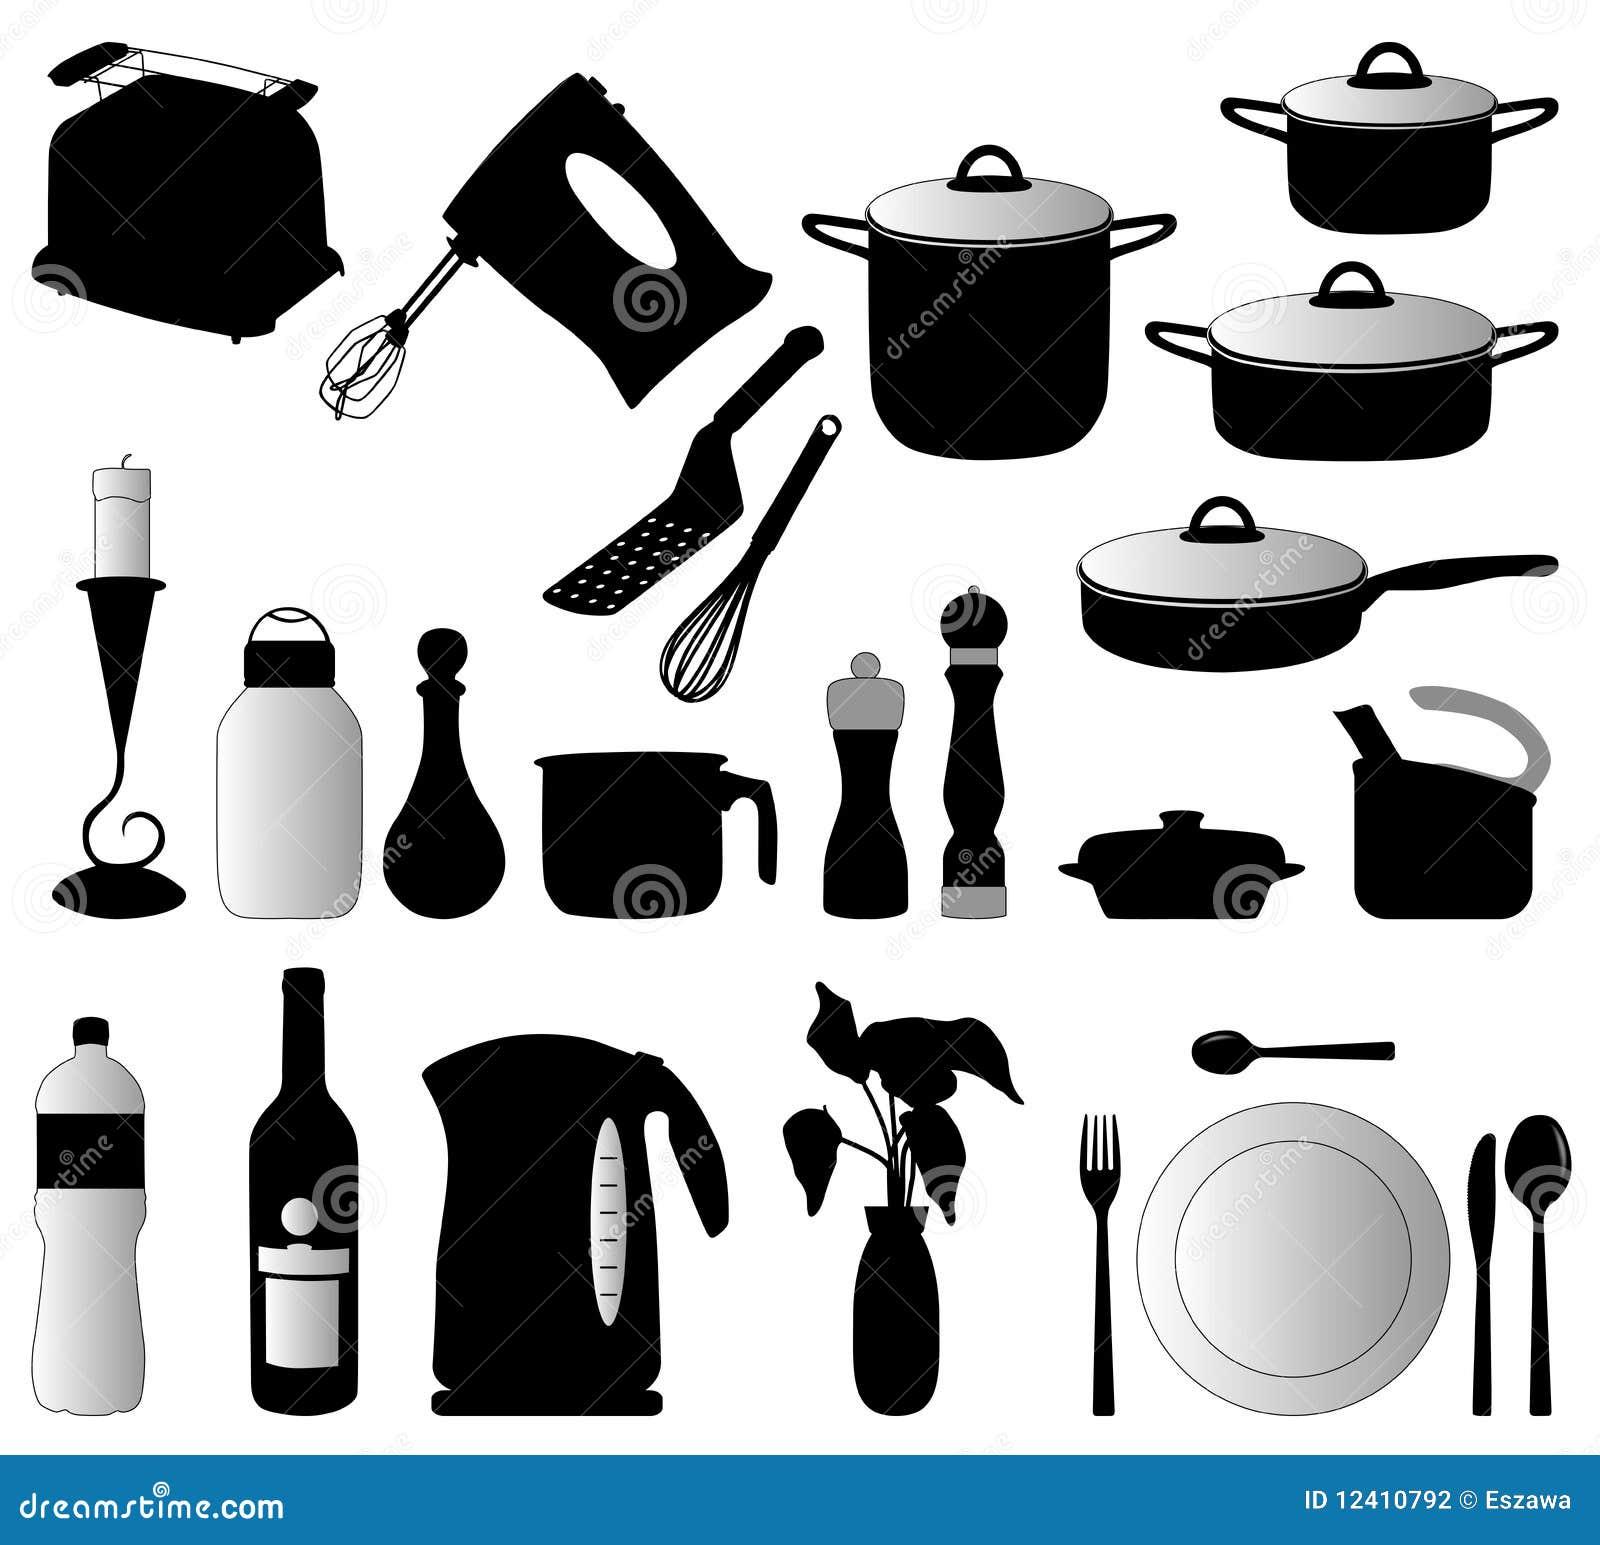 Kitchen objects silhouette vector stock photography - Objet de cuisine ...